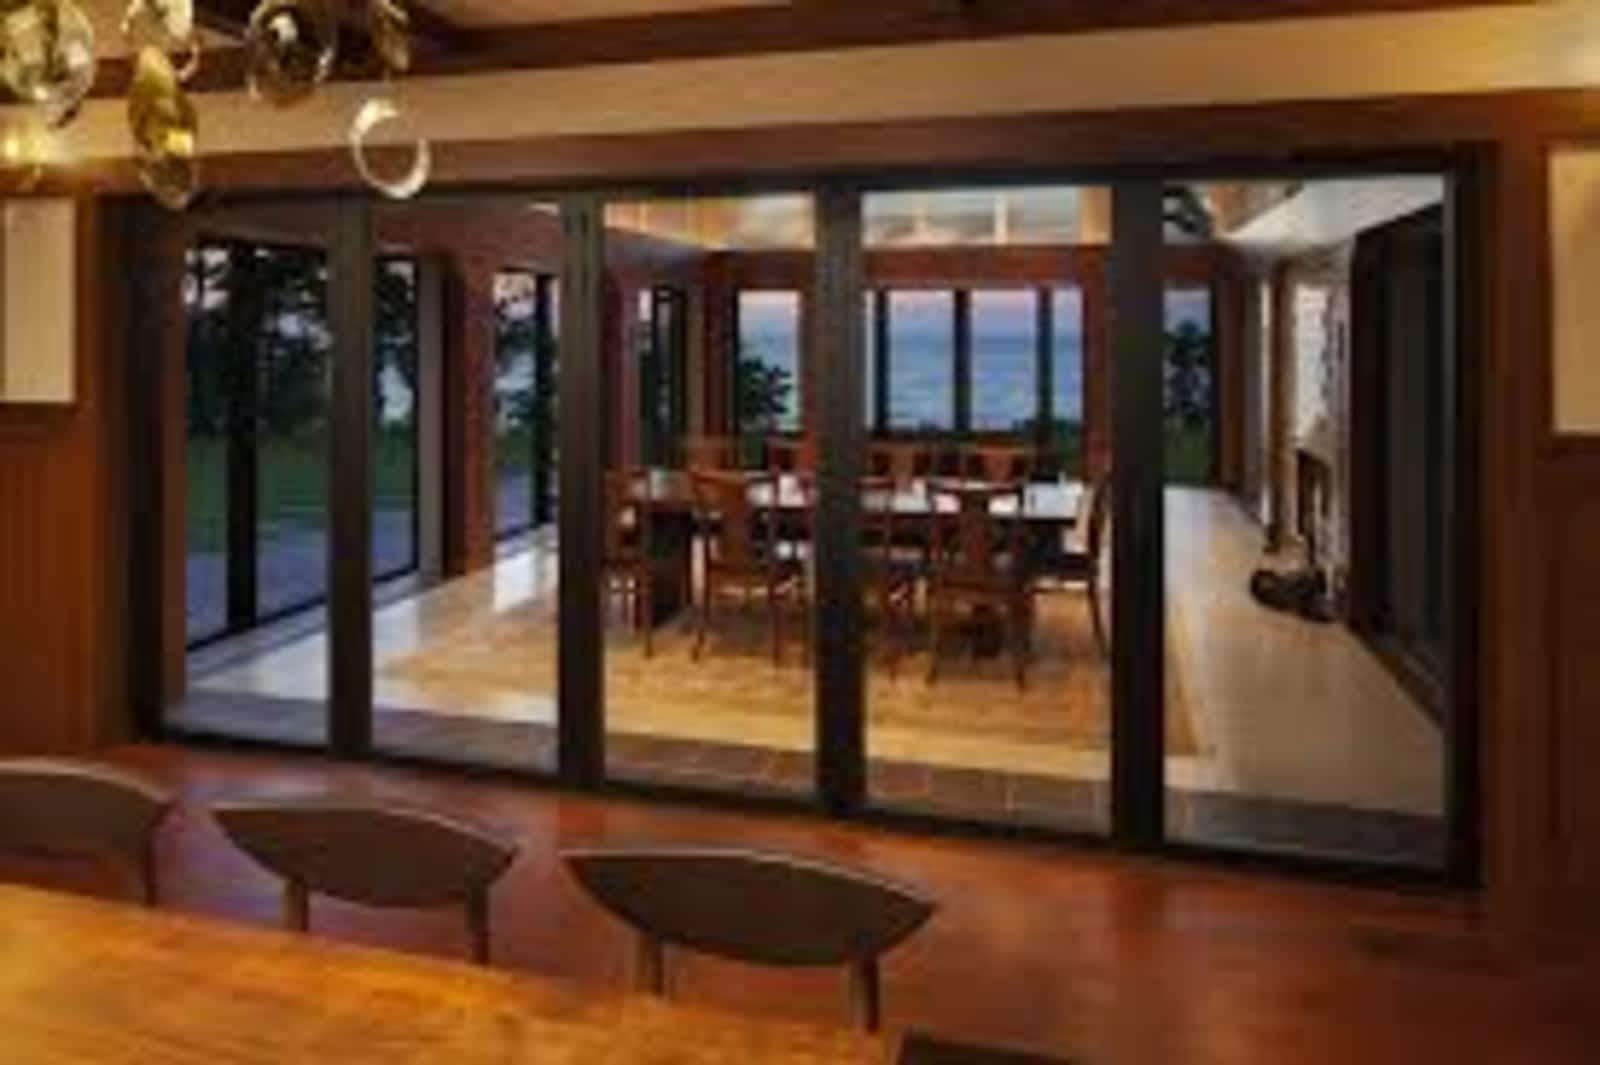 Sustainable Windows \u0026 Doors - Opening Hours - 20 Hallett Cres St. John\u0027s NL & Sustainable Windows \u0026 Doors - Opening Hours - 20 Hallett Cres St ...